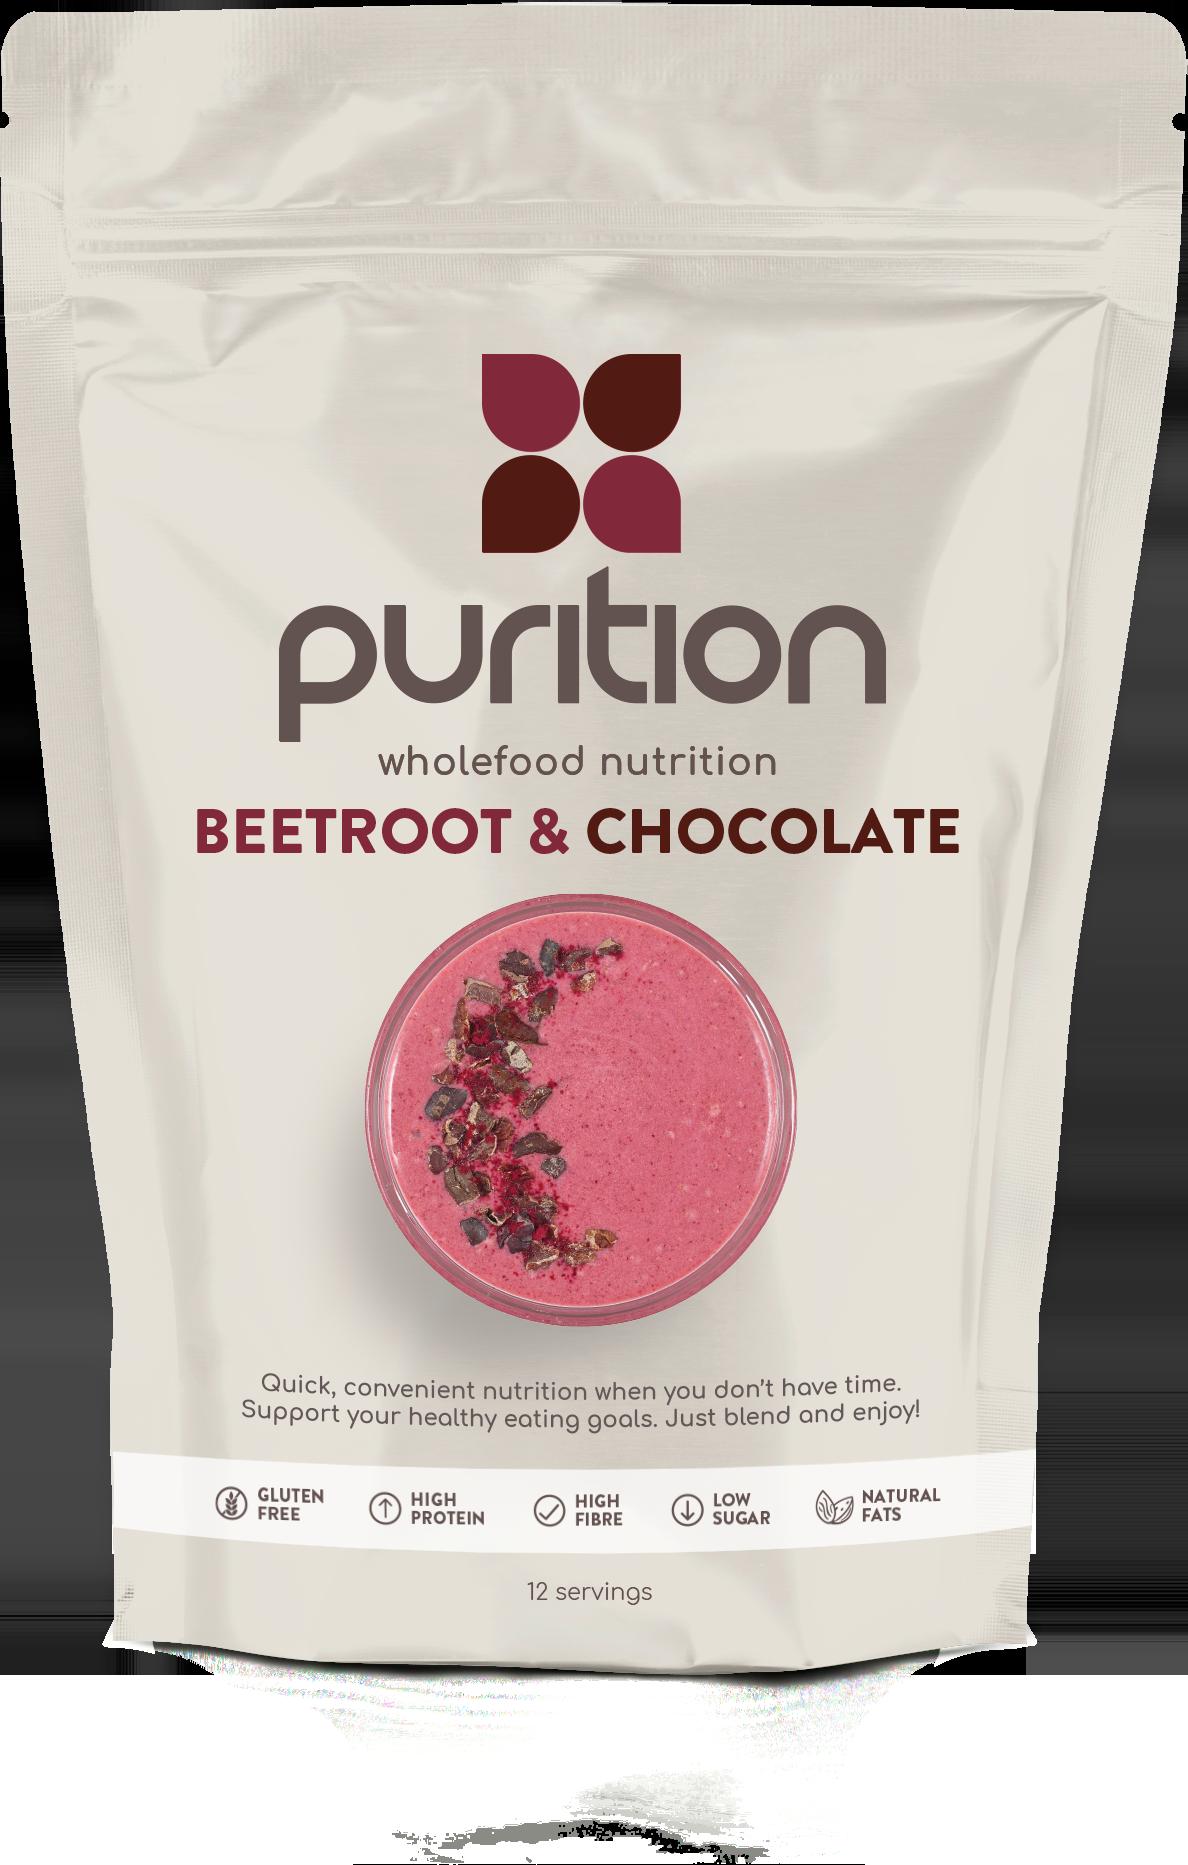 344009 beetroot and chocolate purition original 22d1d7 original 1580385536